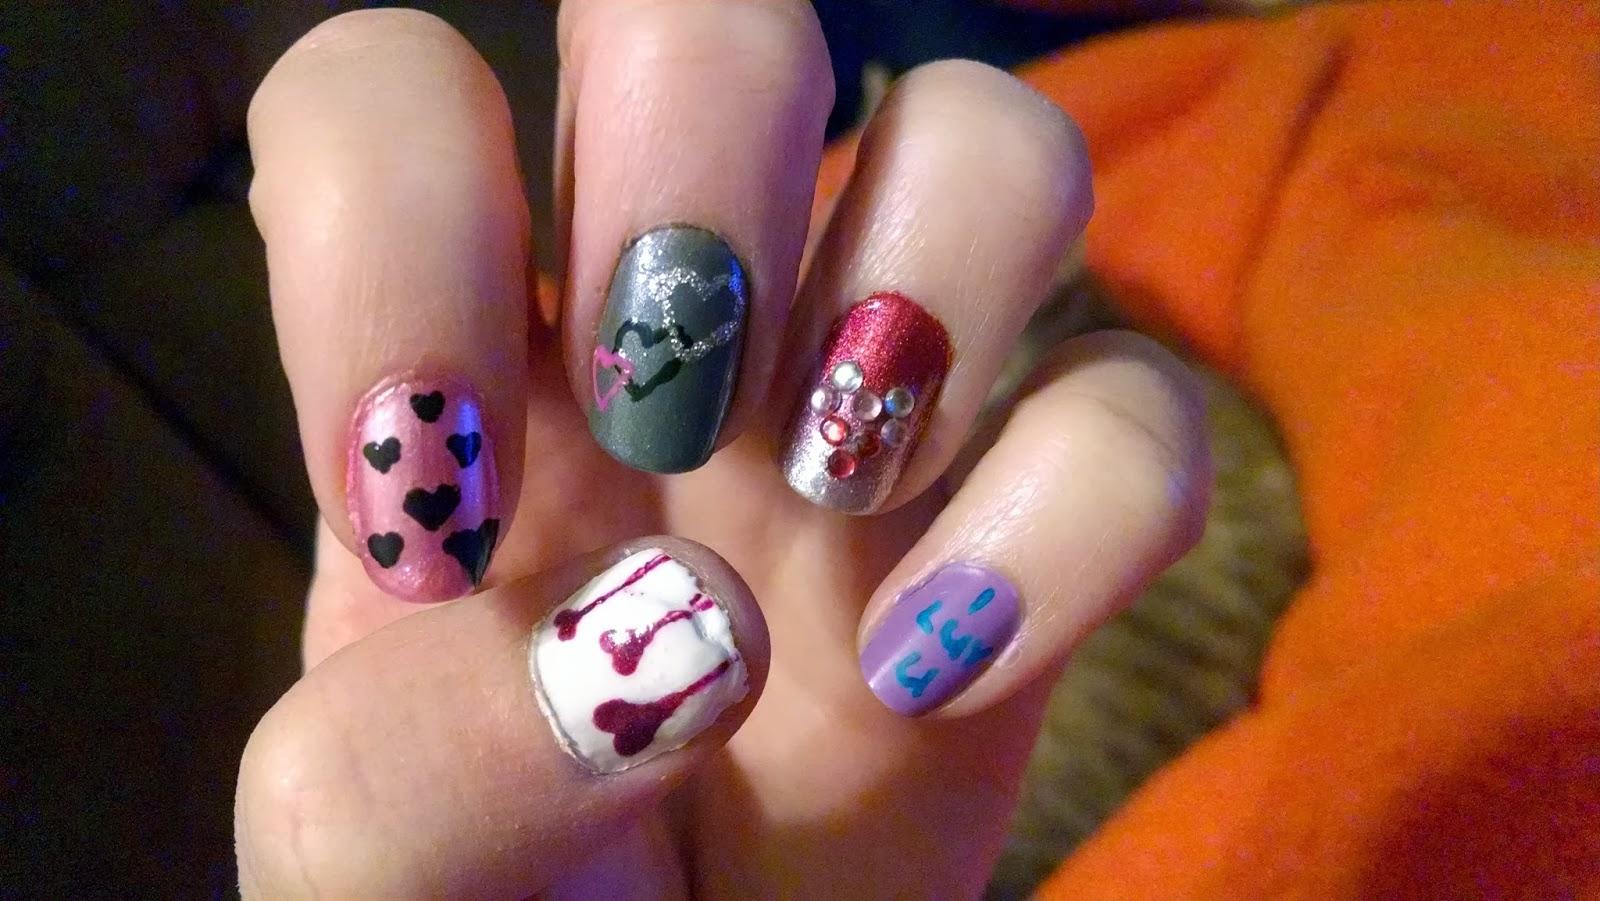 The Nail Diaries: Valentine's 2013 Medley Nail Design